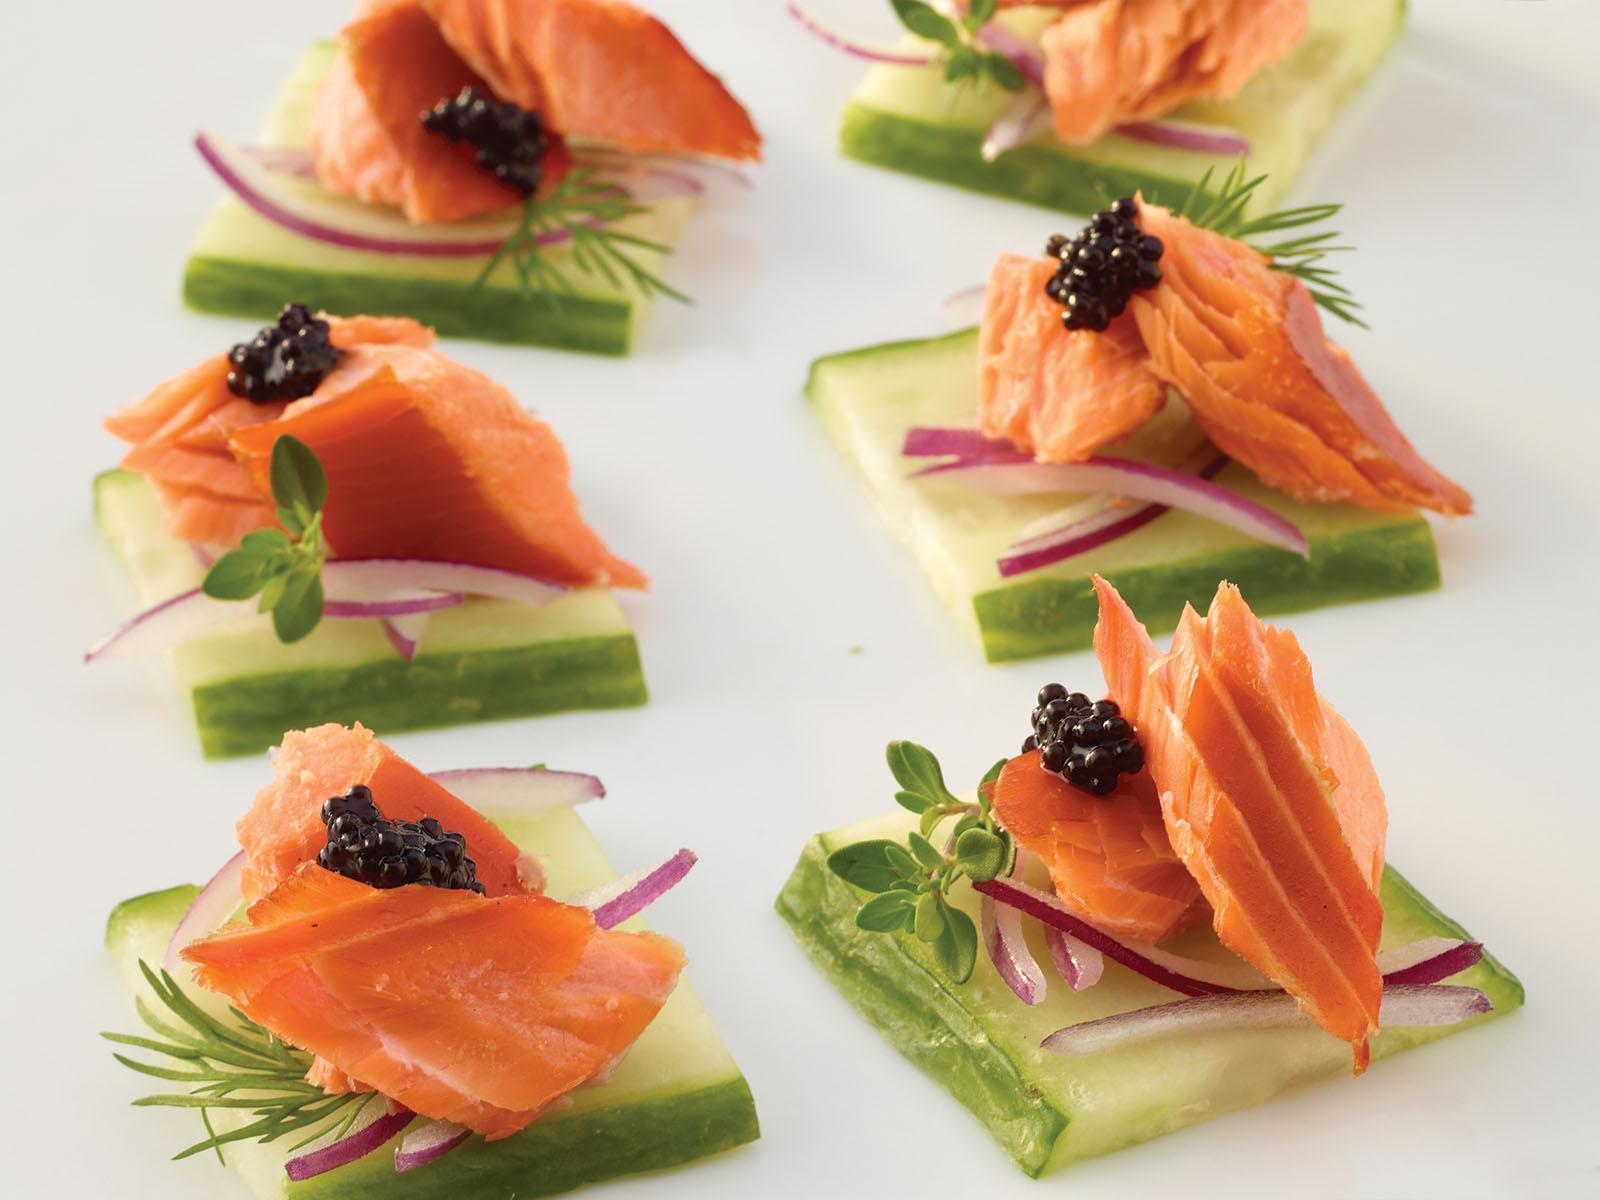 Trident Seafoods® Smoked Sockeye Salmon - Traditional 4 oz